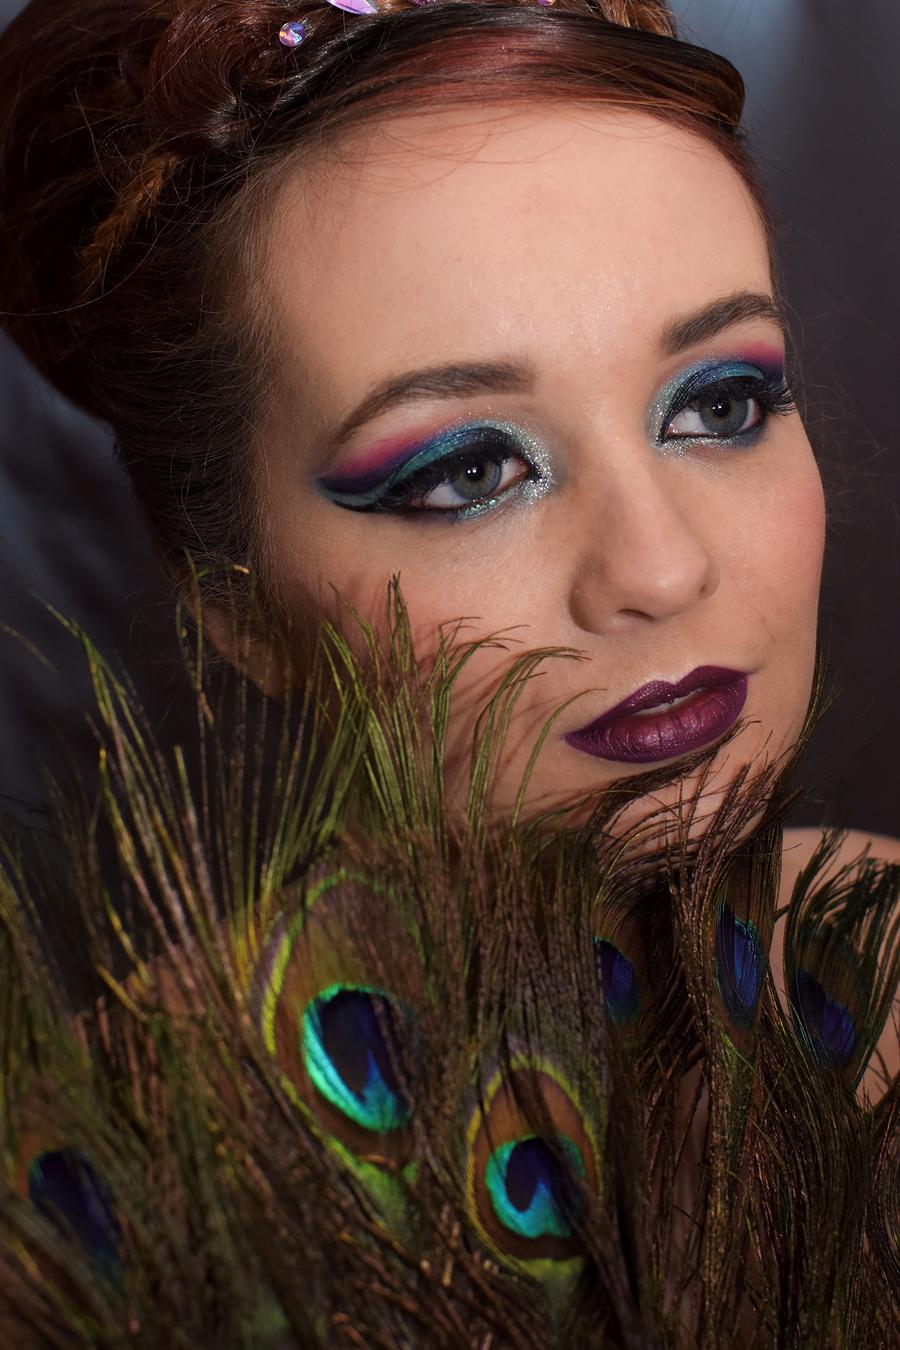 peacock beauty / Photography by pierangela manzetti, Model OliviaBlue, Makeup by pierangela manzetti, Hair styling by pierangela manzetti / Uploaded 2nd January 2018 @ 12:15 PM